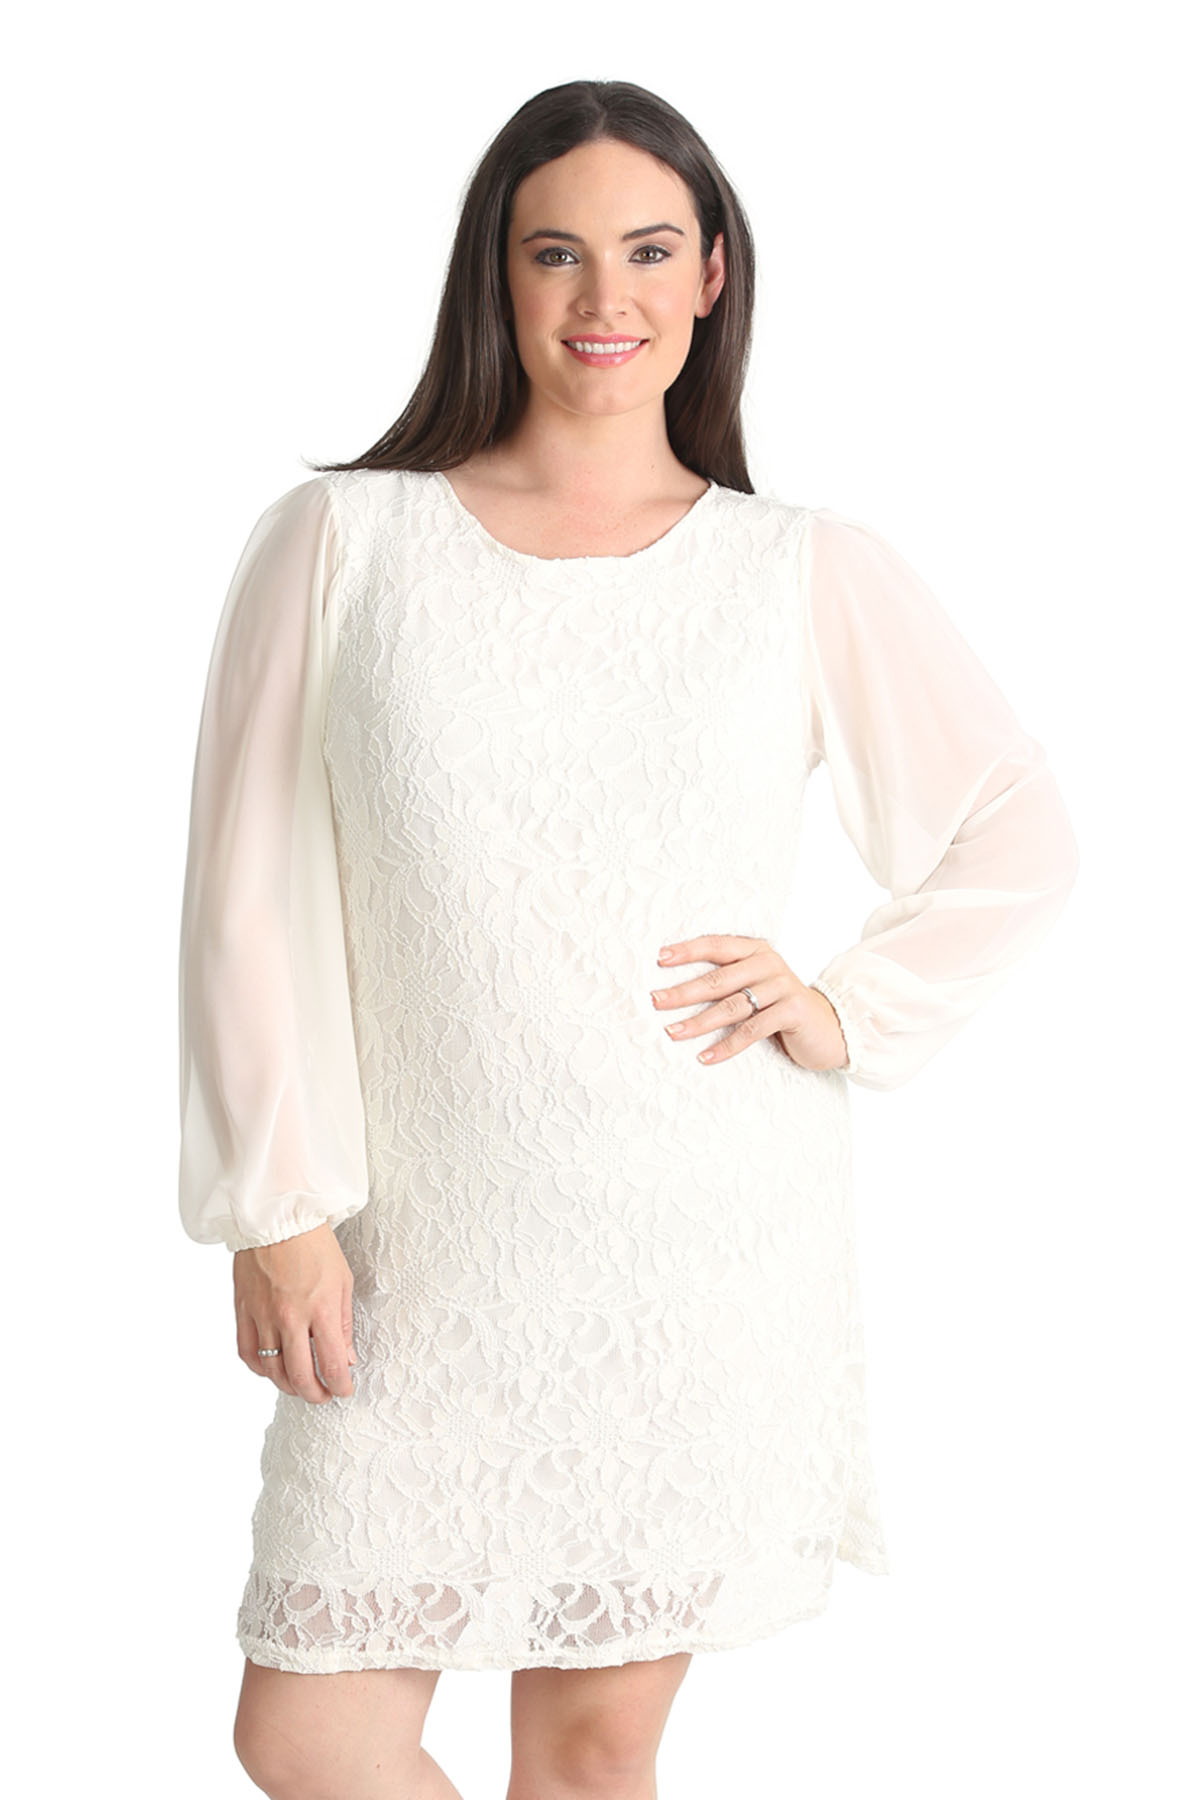 New Ladies Plus Size Dress Womens Floral Lace Chiffon